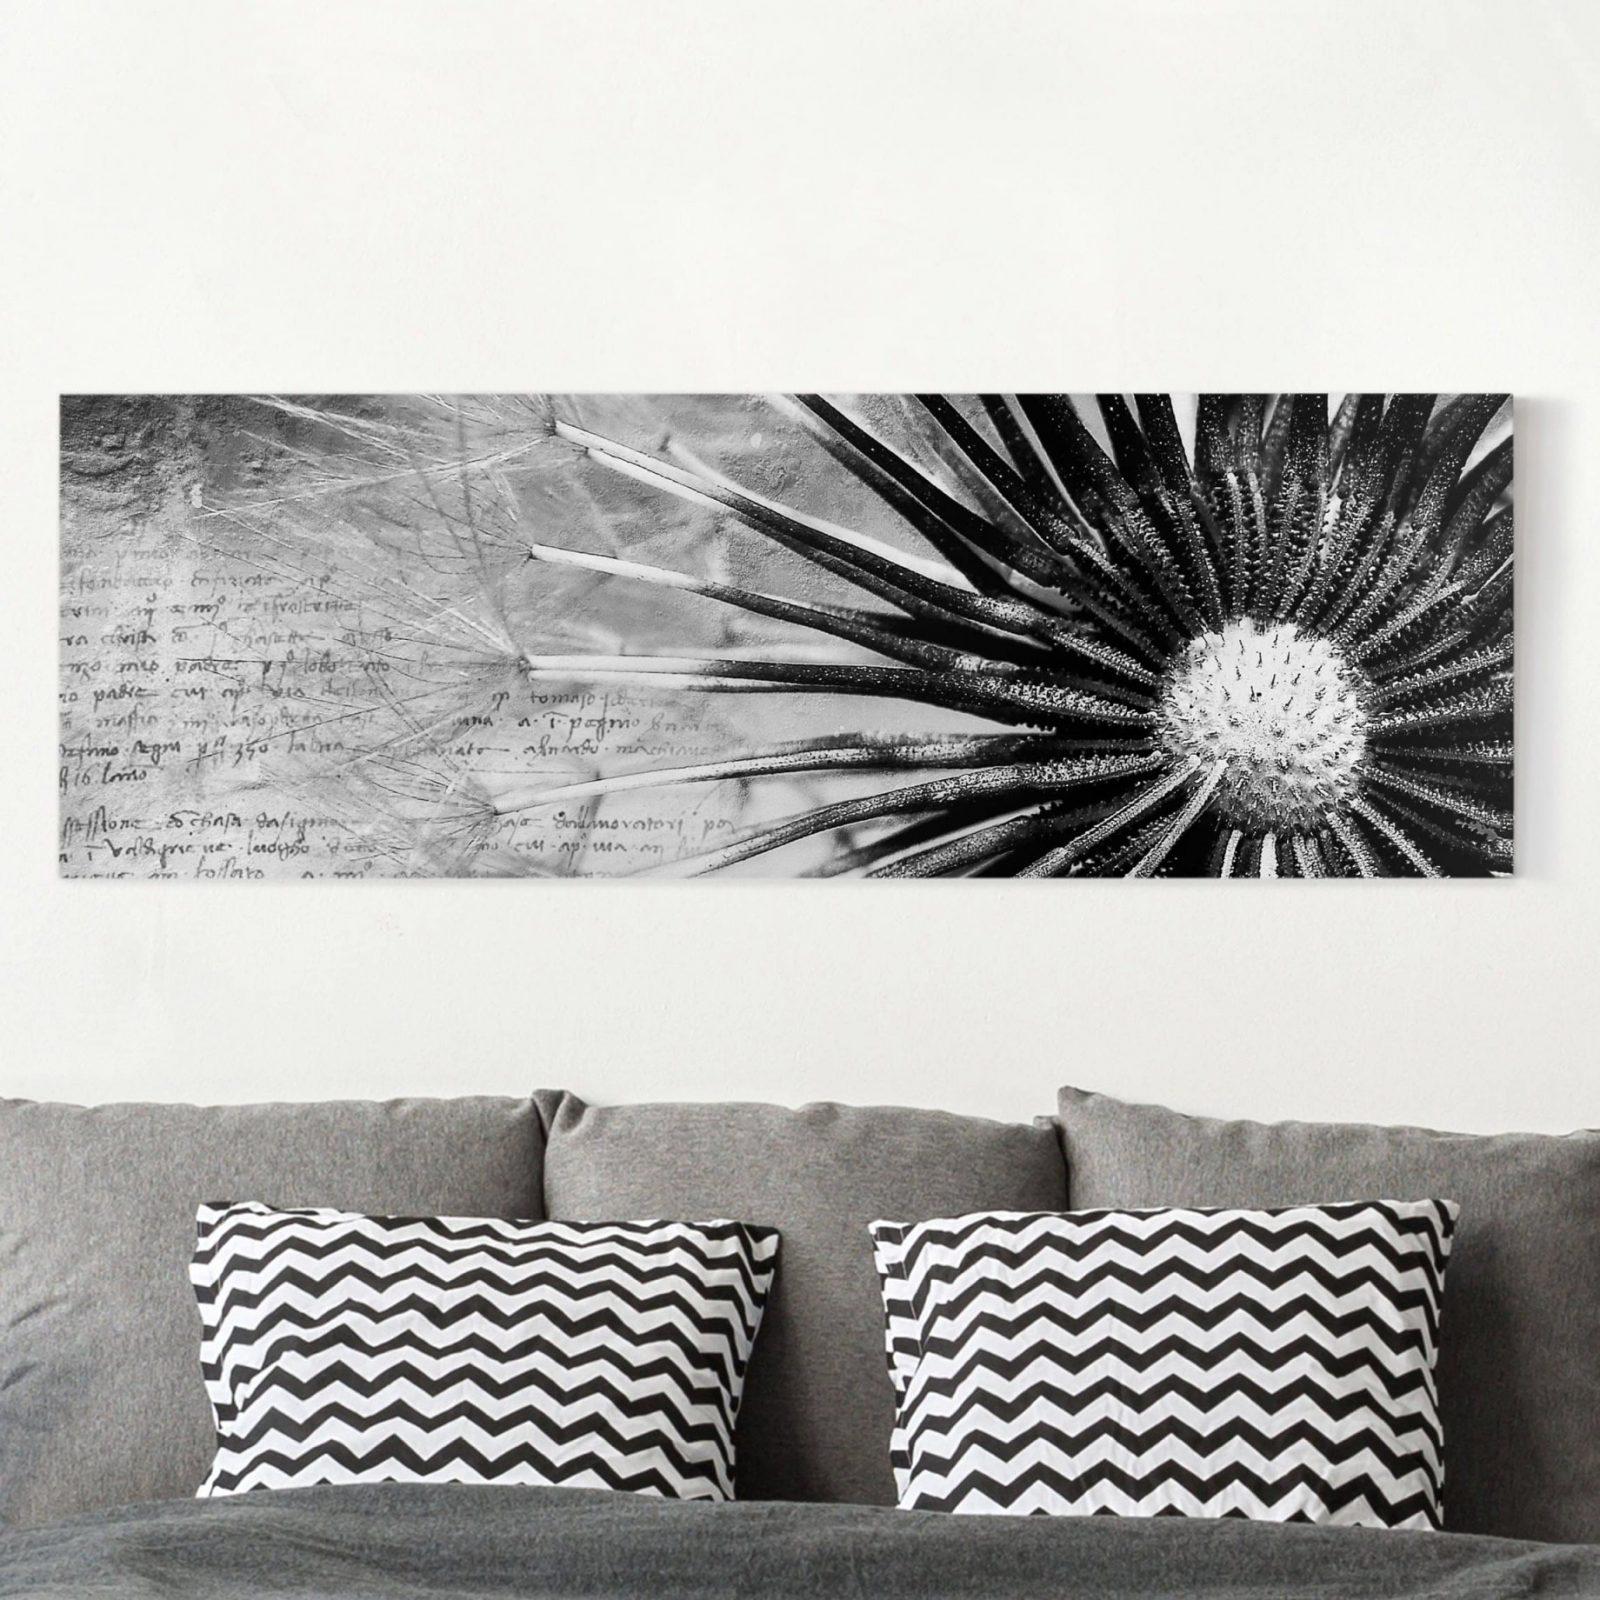 Leinwandbild Schwarzweiß  Pusteblume Schwarz  Weiß  Panoramabild von Leinwandbilder Schwarz Weiß Xxl Bild